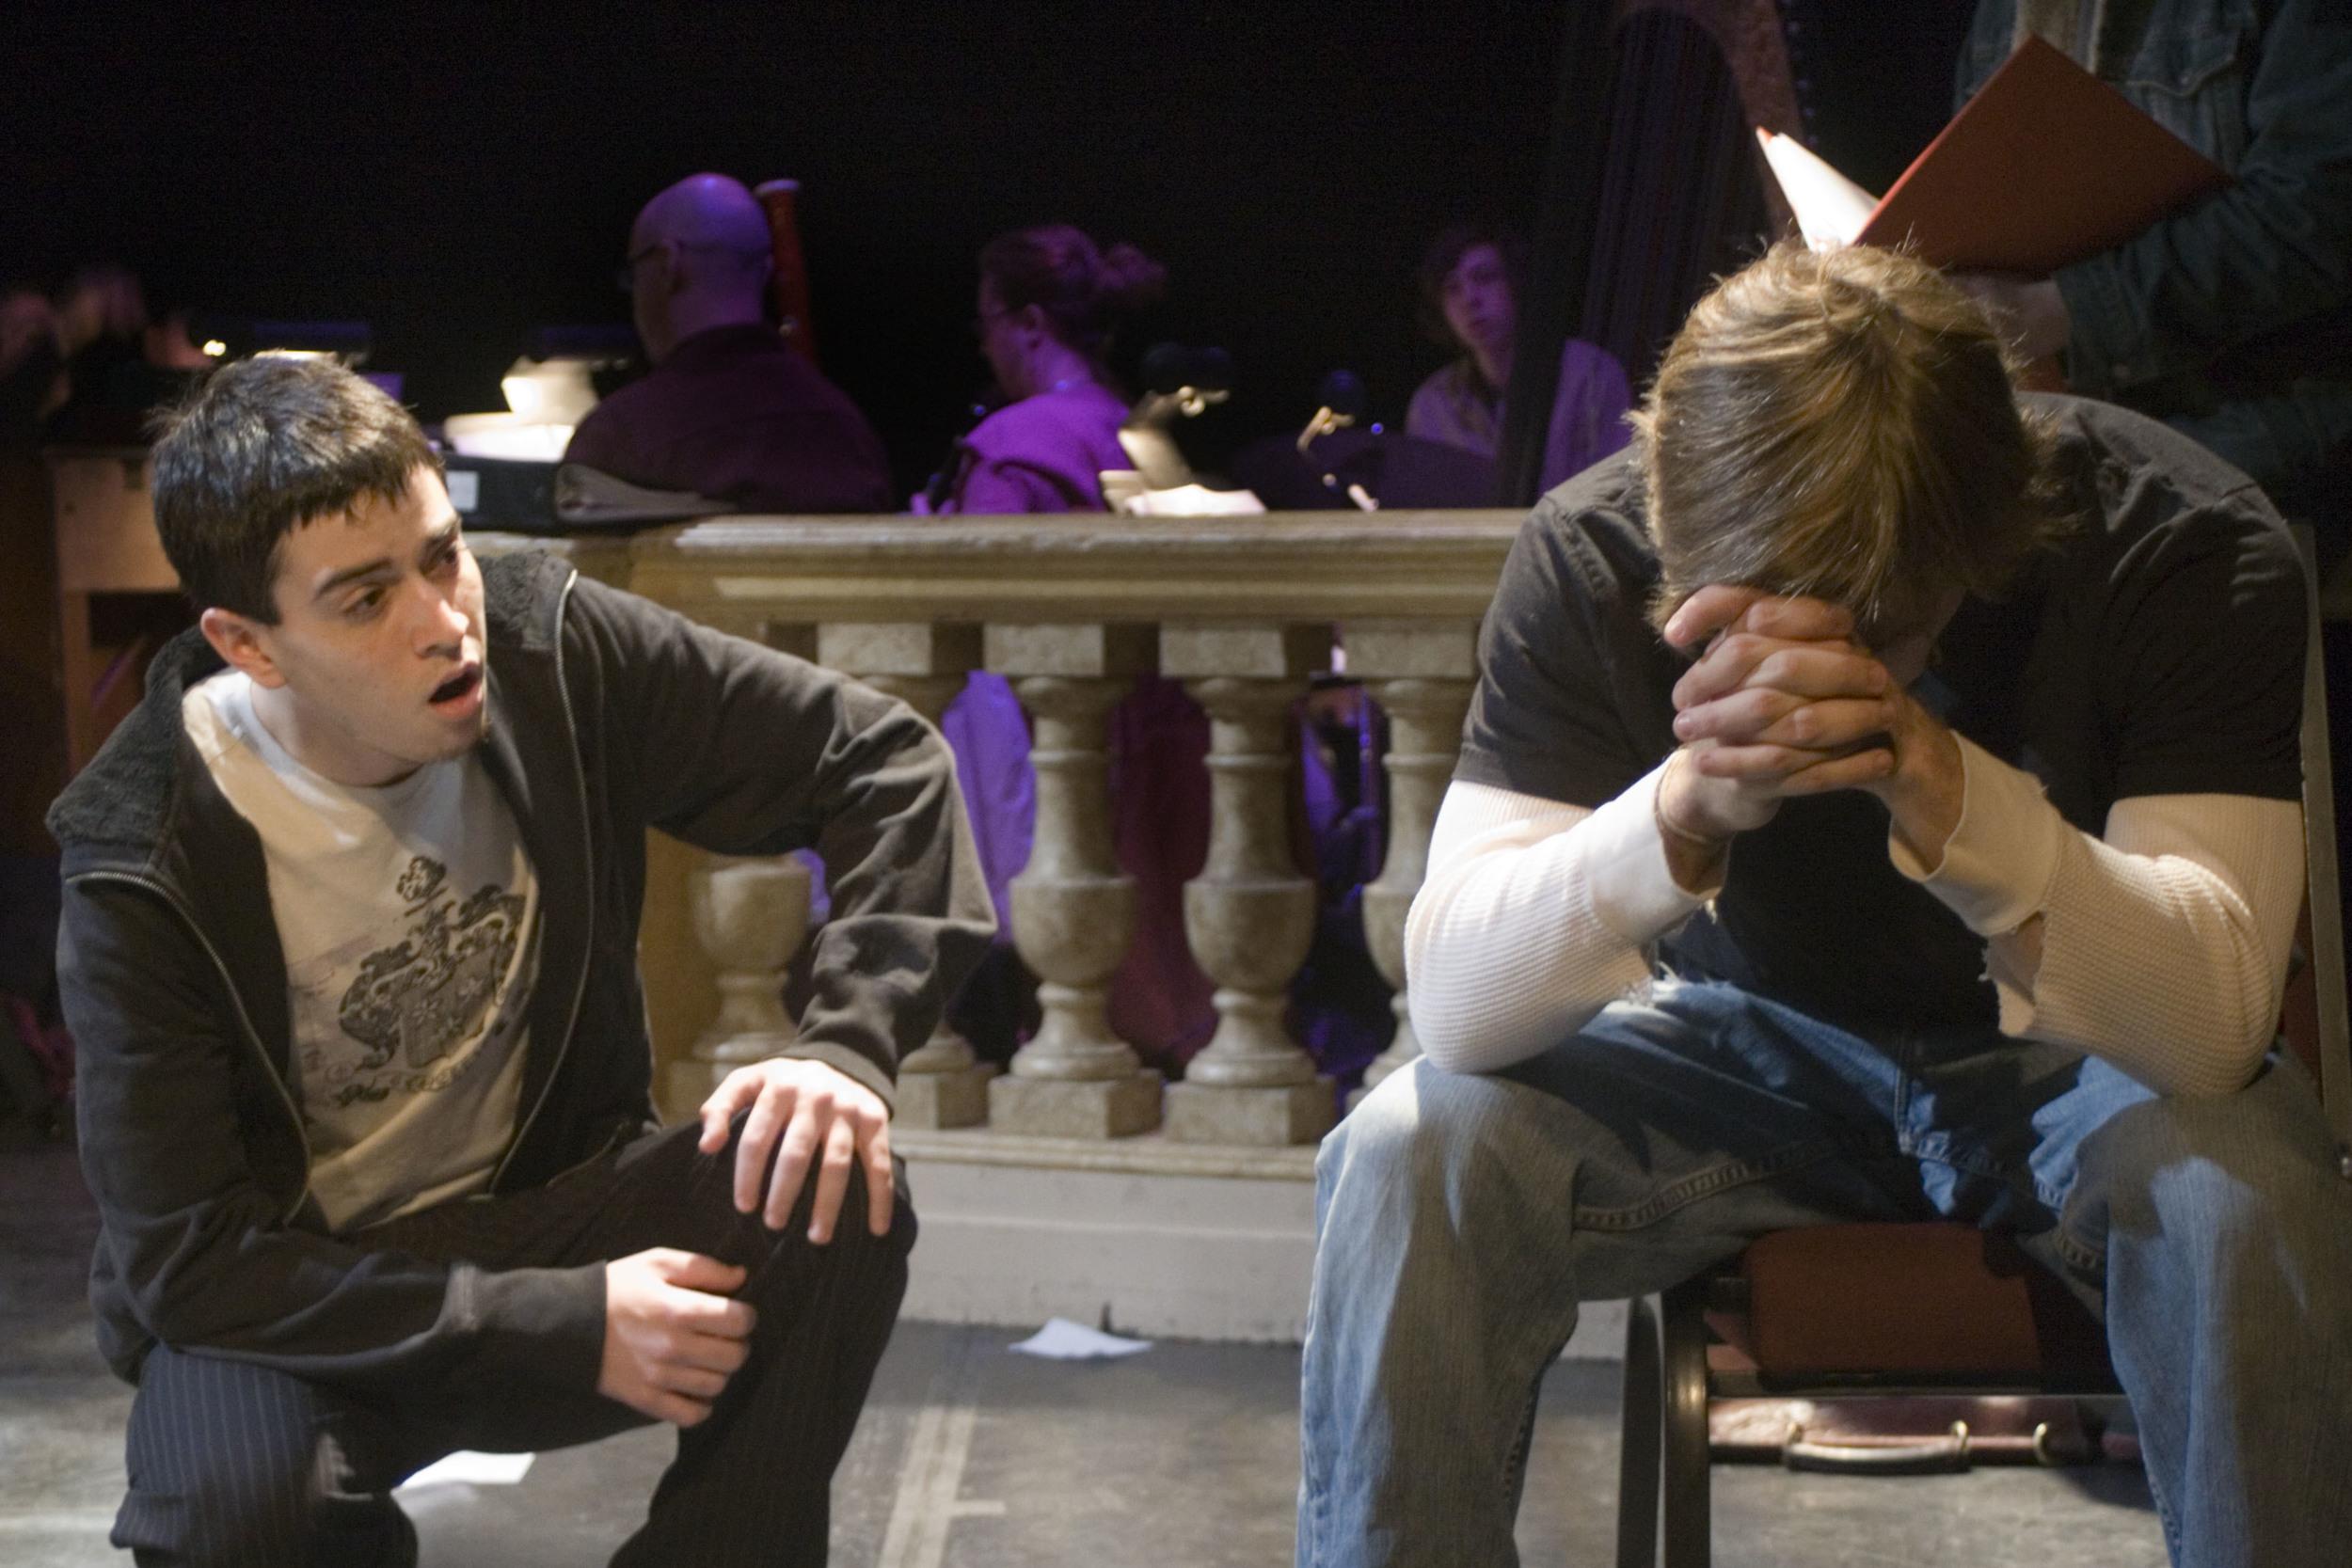 Evan Jay Newman and Adam Hose. Photo by Lauren Braun